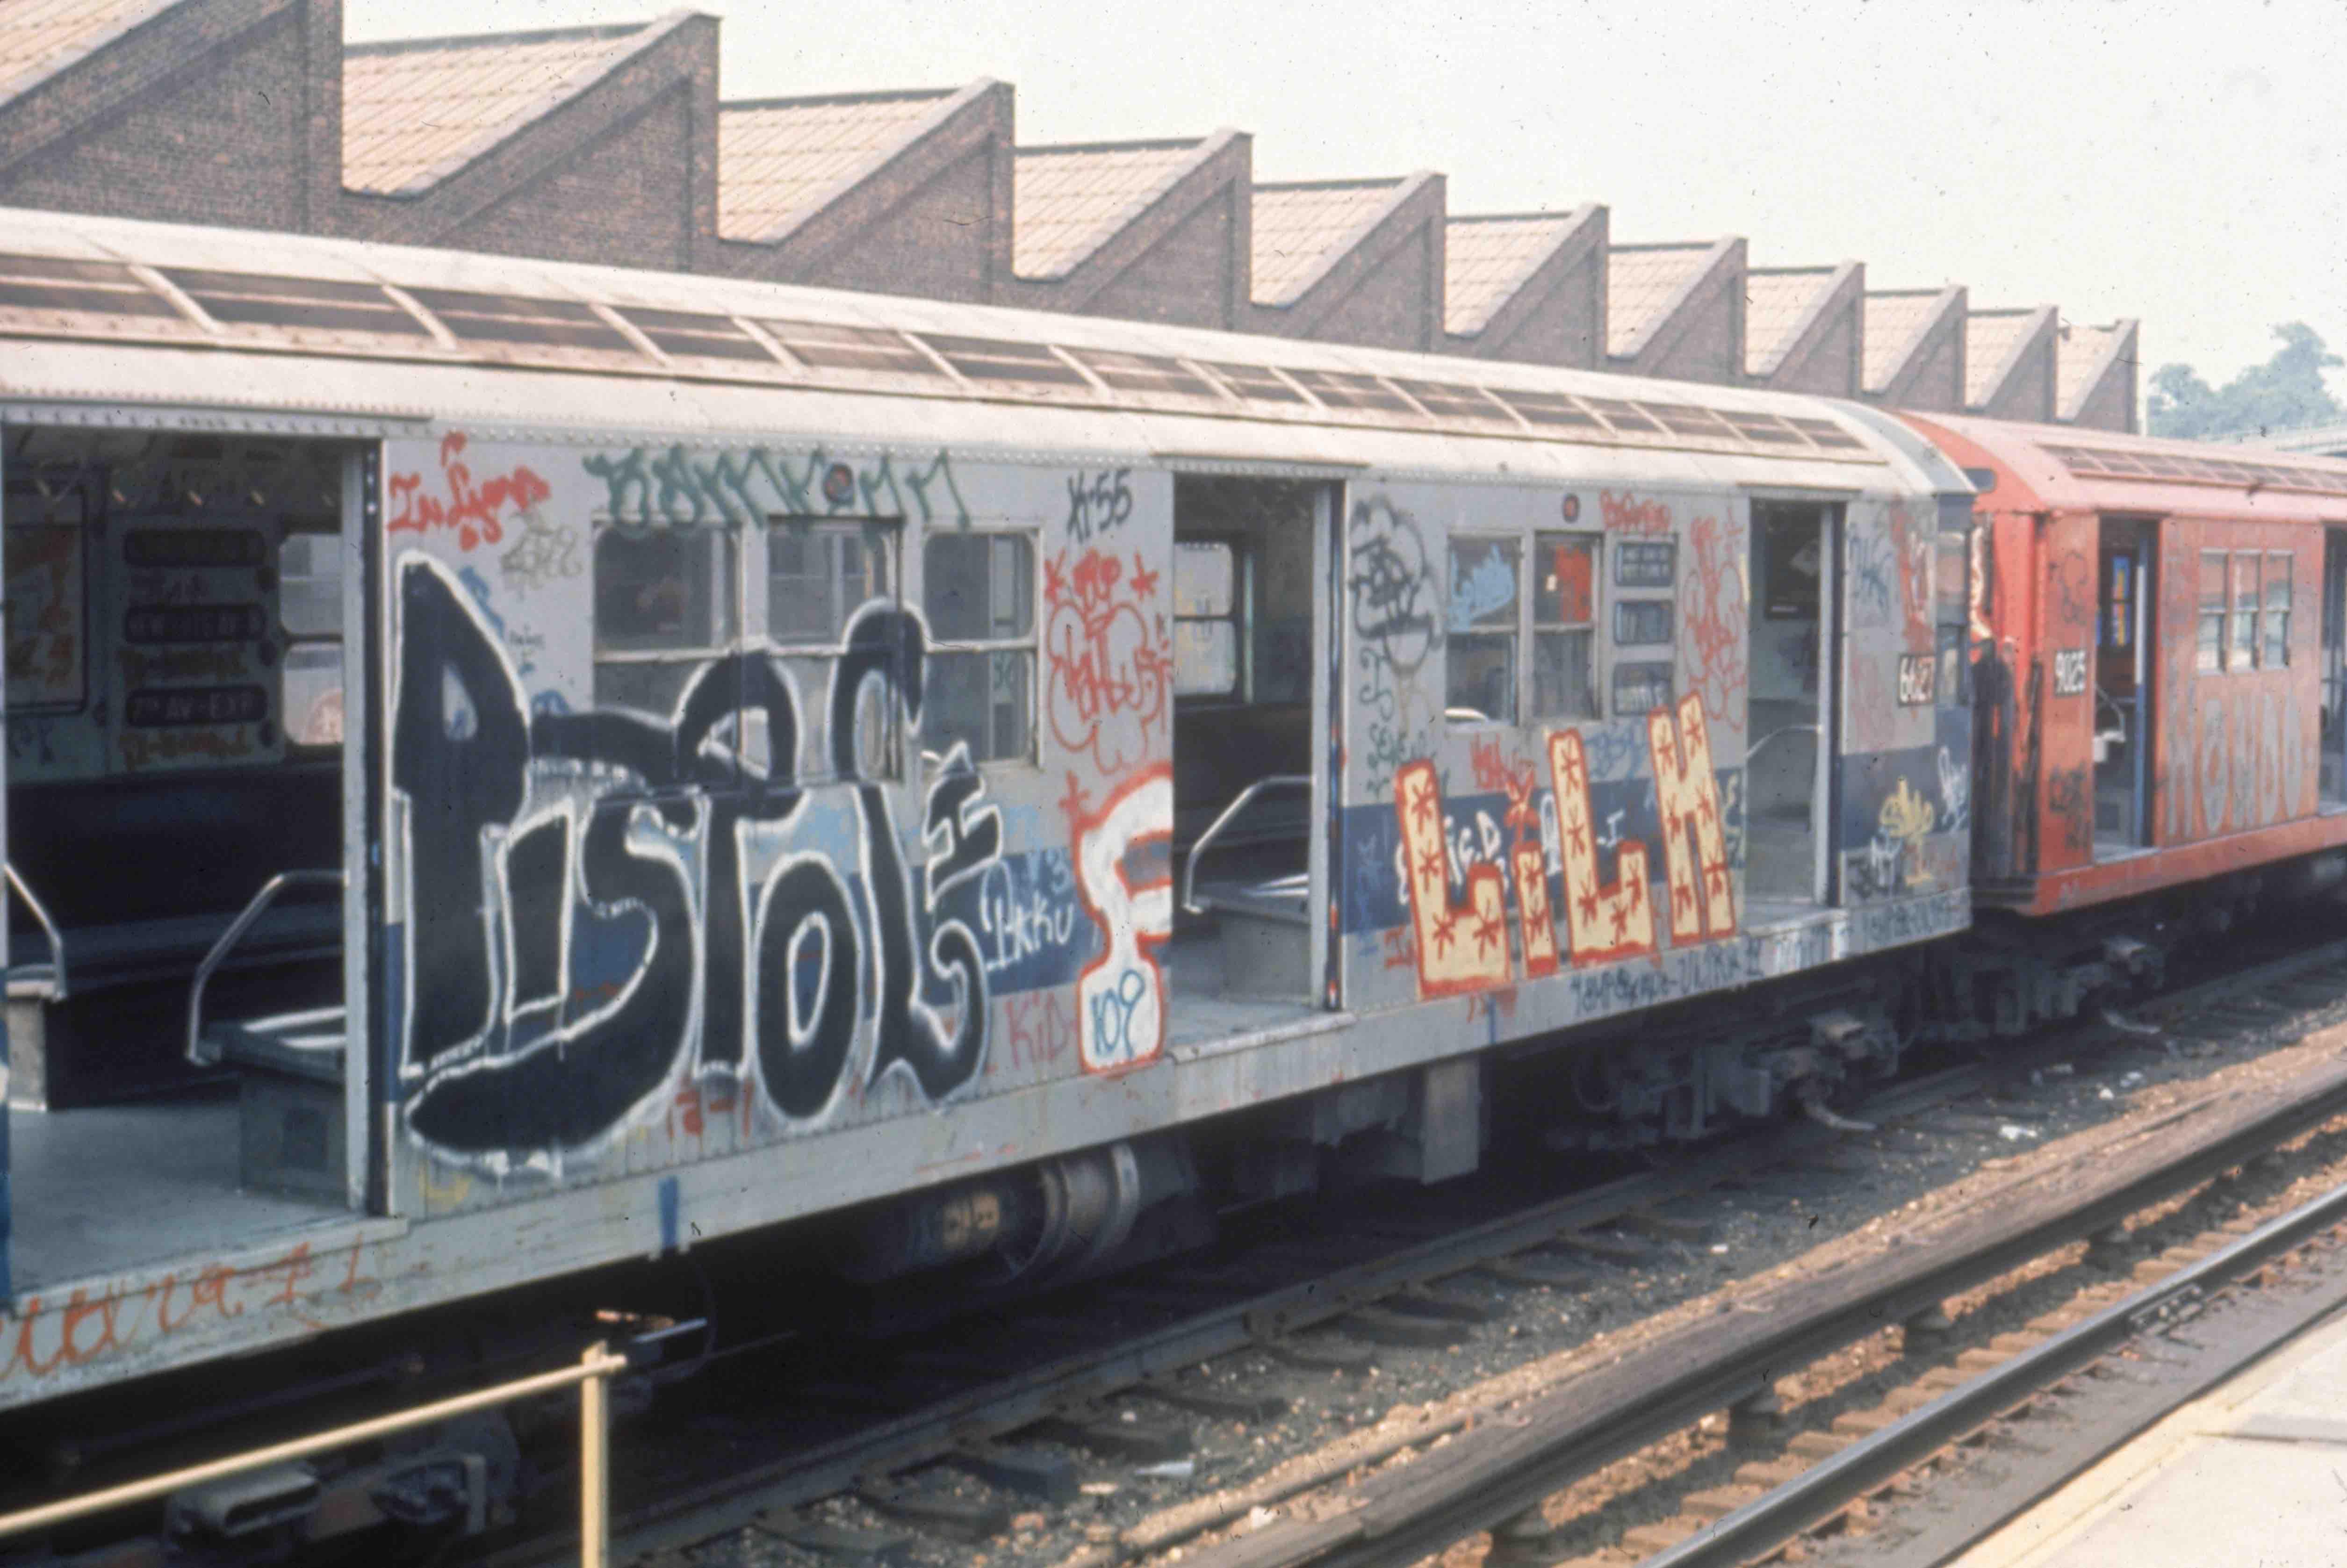 Boricua Subway Graffiti Icon Lee Quiñones to Speak on Latinx Graffiti Panel